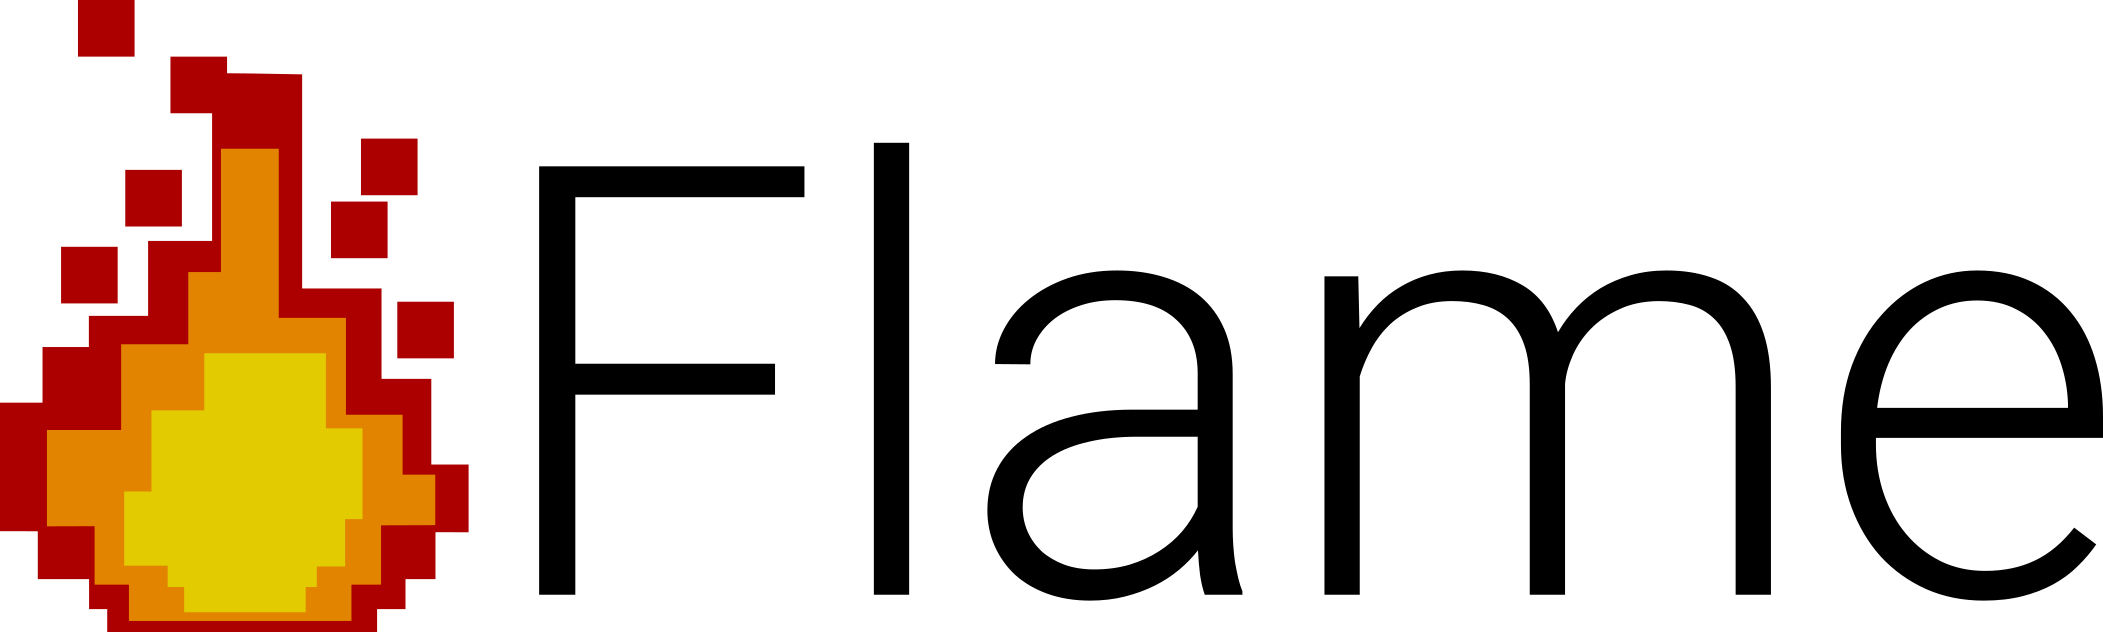 A minimalist Flutter game engine